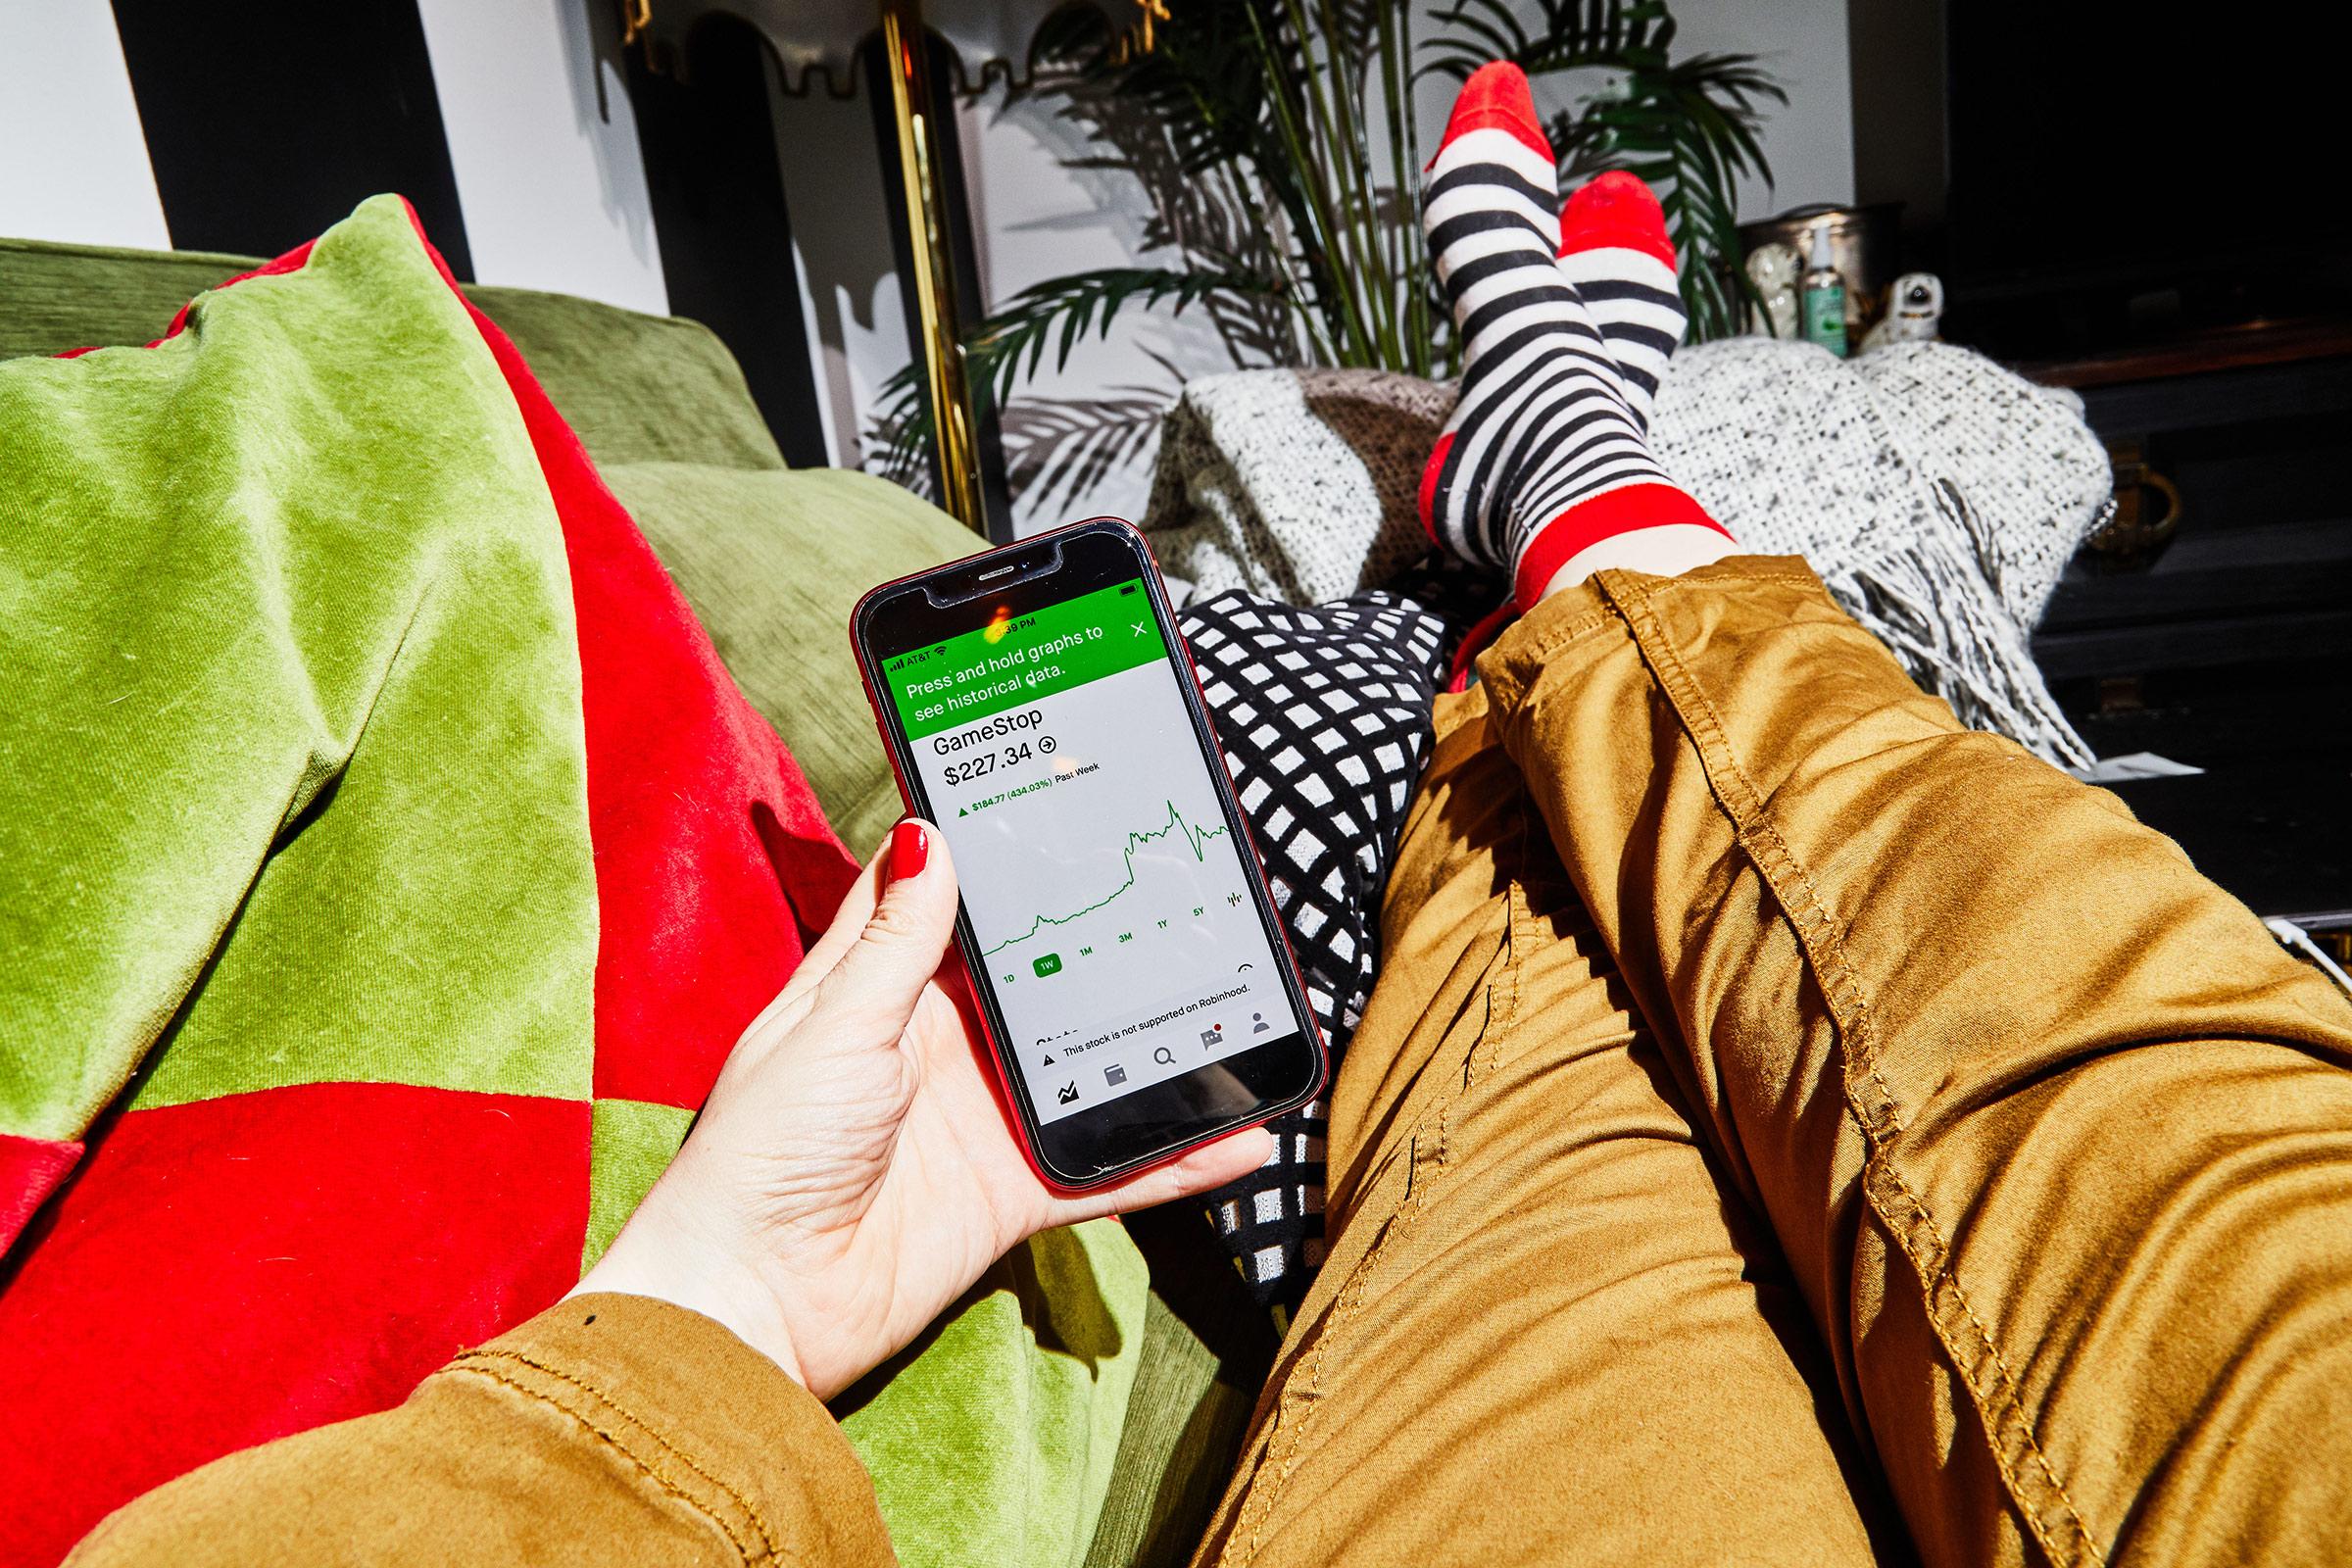 The Robinhood app displays Gamestop's stock price on a phone in New York on Jan. 28, 2021.